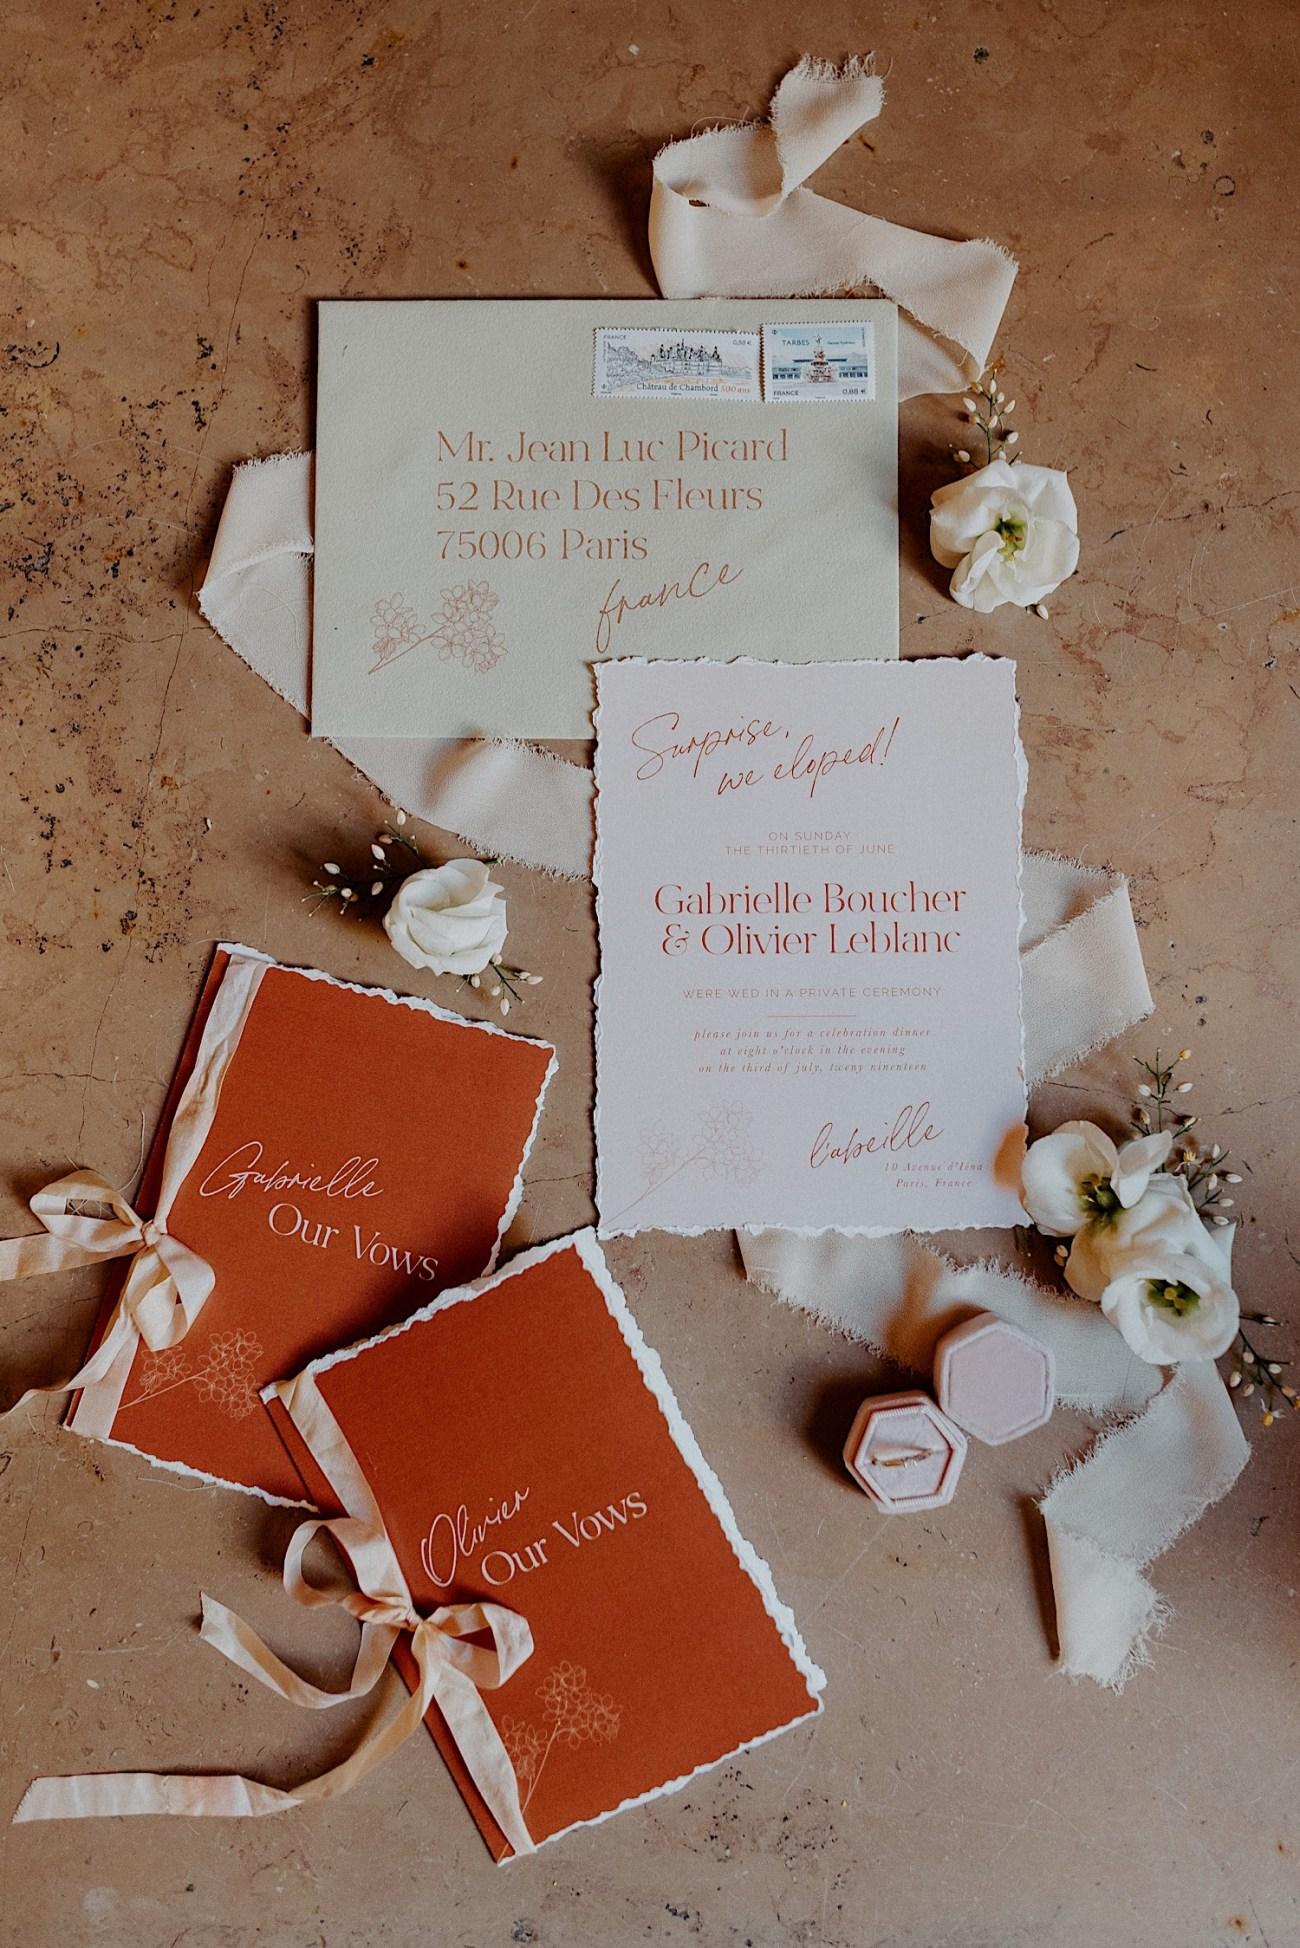 Paris Wedding Photos Paris Wedding Photographer Paris Photographe De Marriage Pont Alexandre Wedding Photos Anais Possamai Photography 01